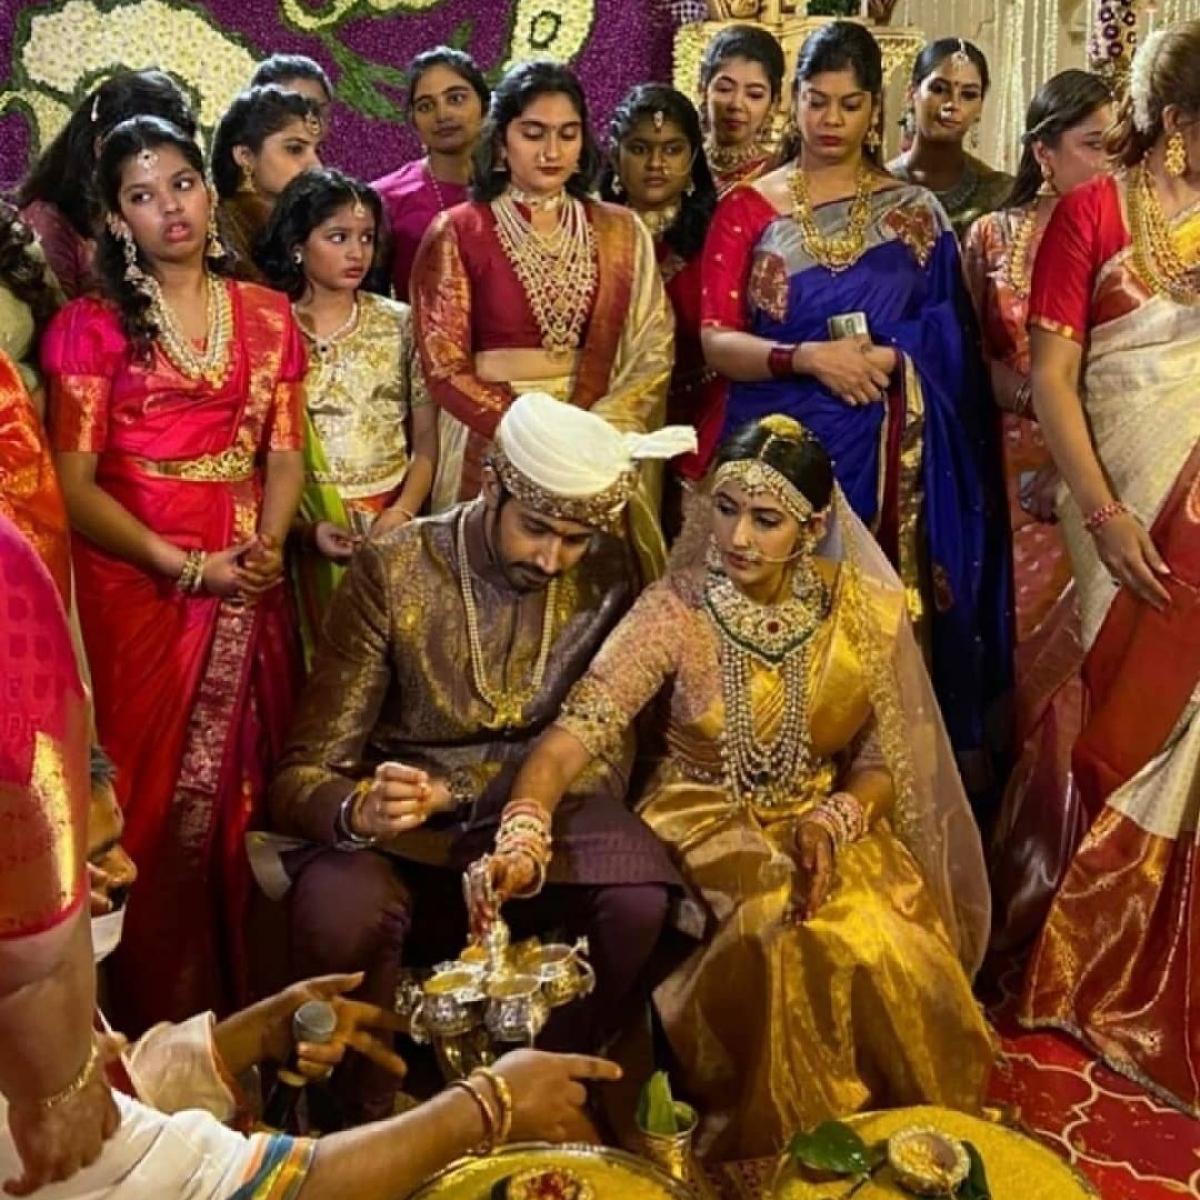 Inside pics, videos from Niharika Konidela and Chaitanya JV's lavish Udaipur wedding